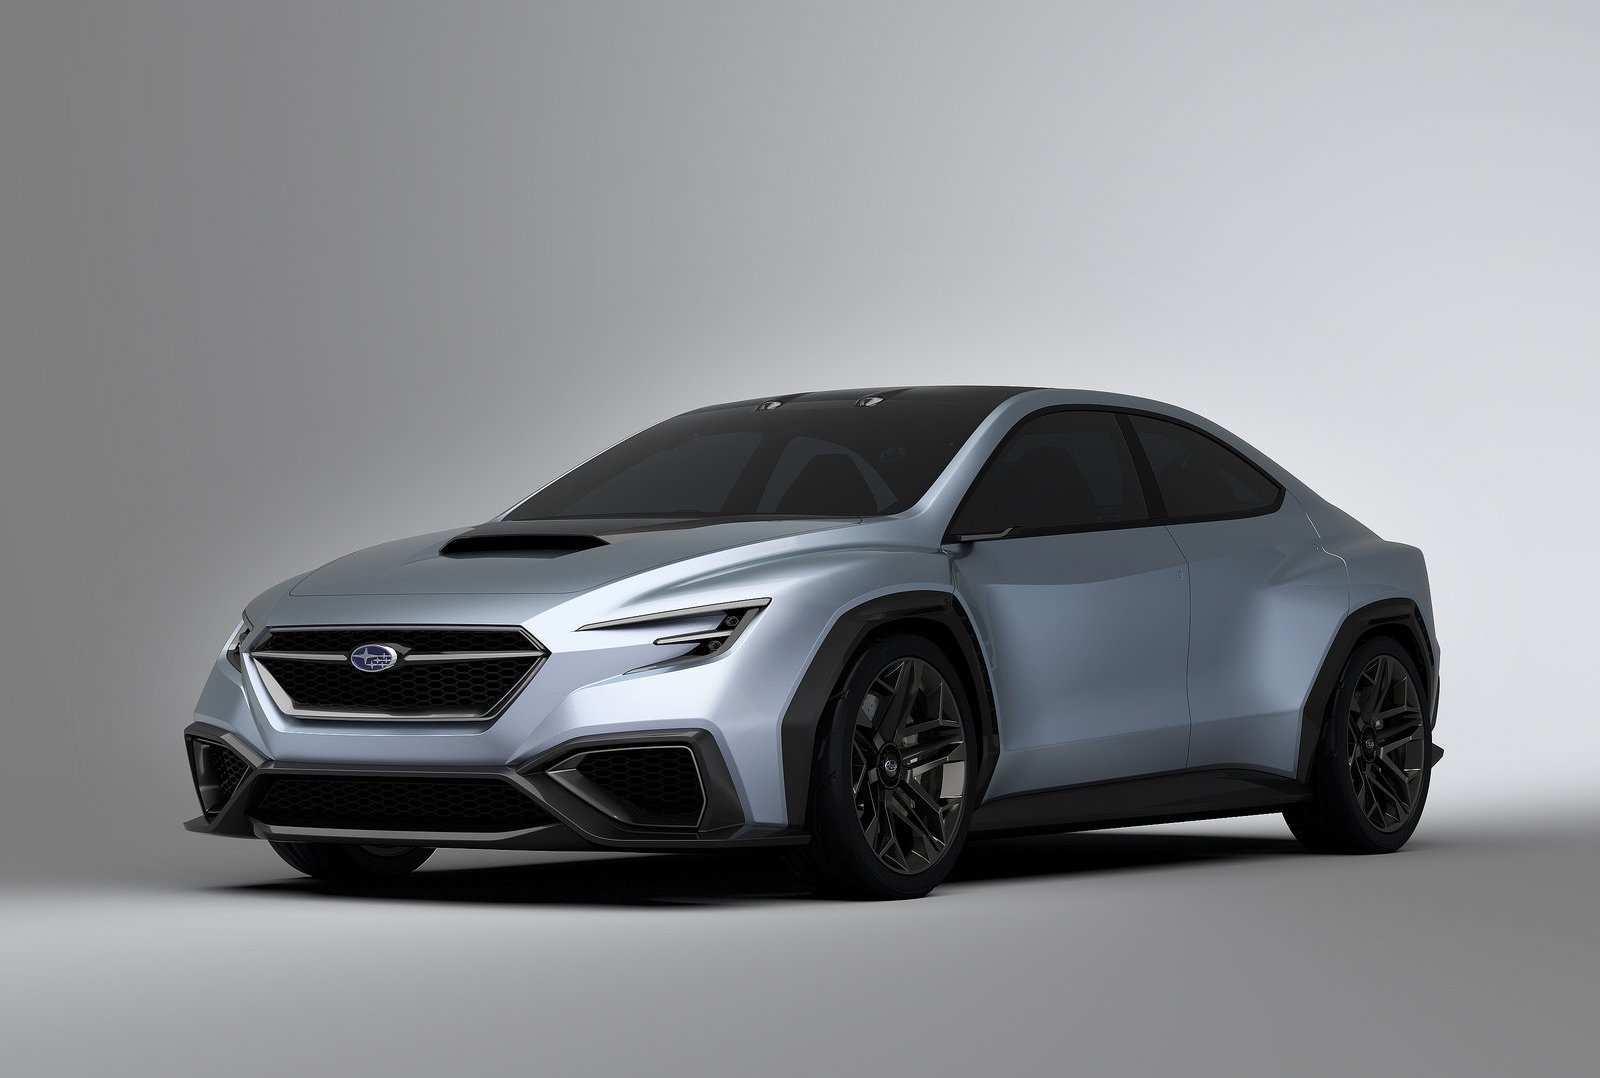 16 All New Subaru Wrx 2020 Performance by Subaru Wrx 2020